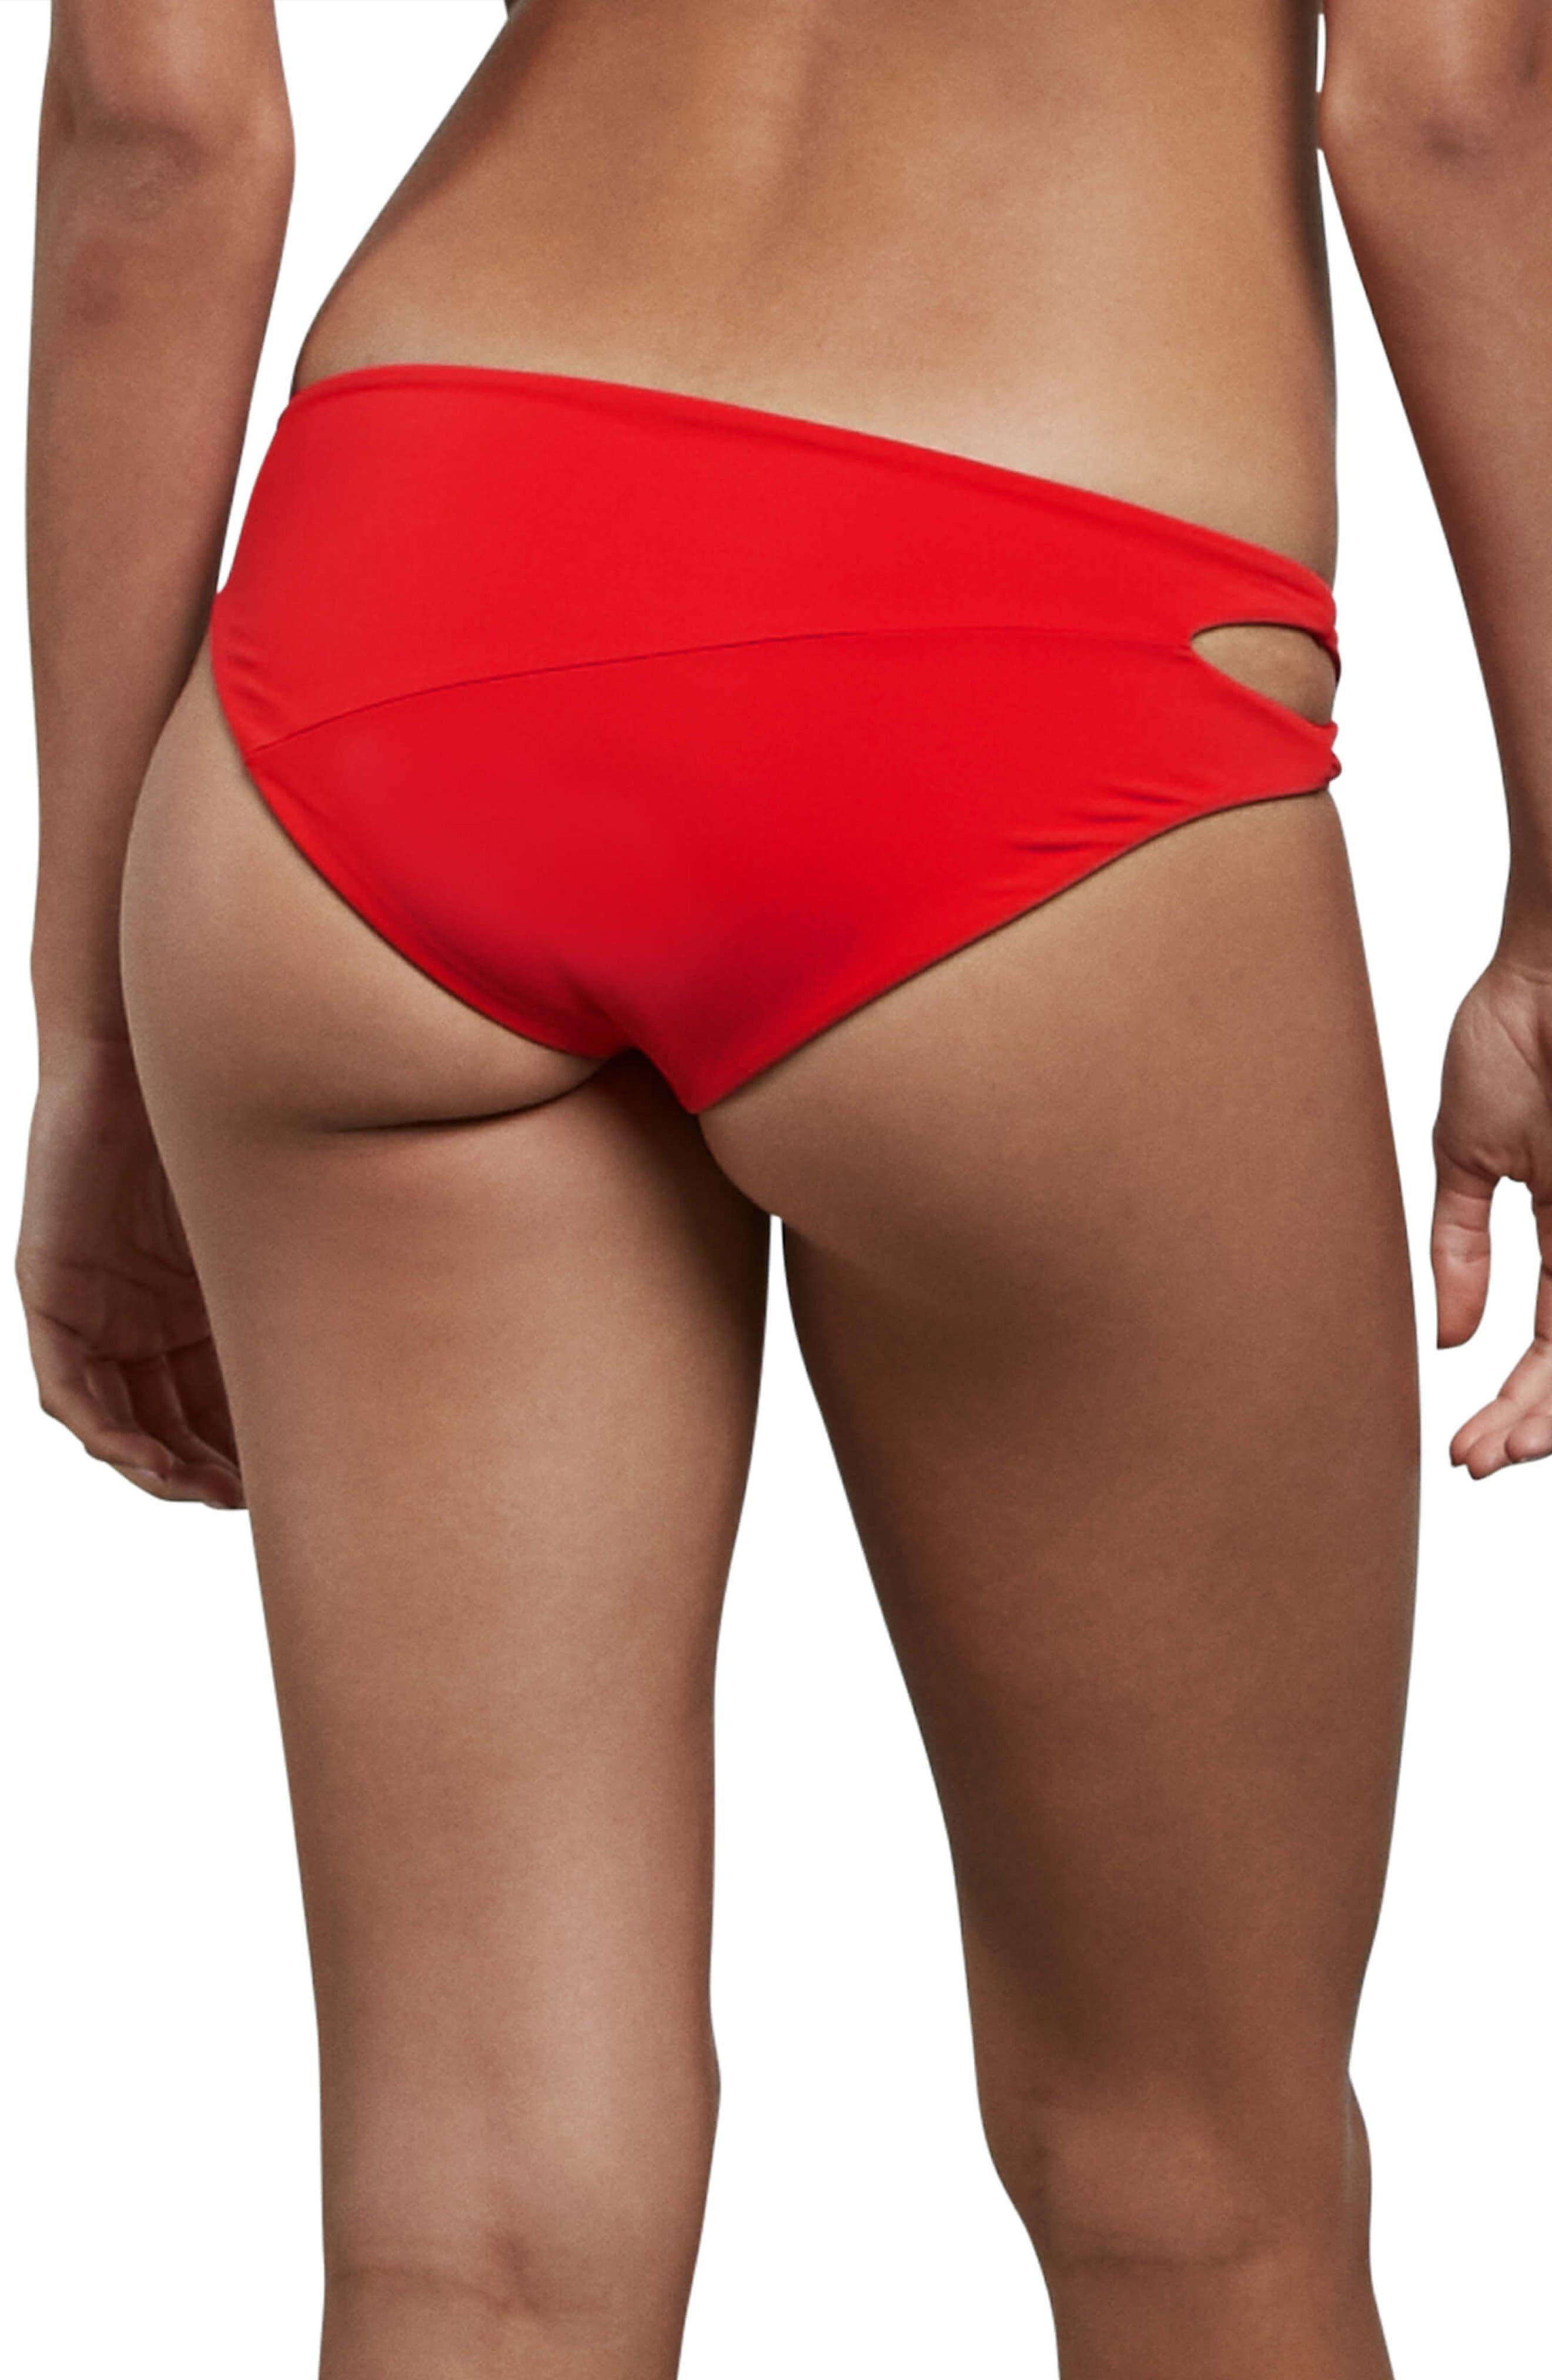 Simply Seamless Bikini Bottoms,                             Alternate thumbnail 2, color,                             True Red